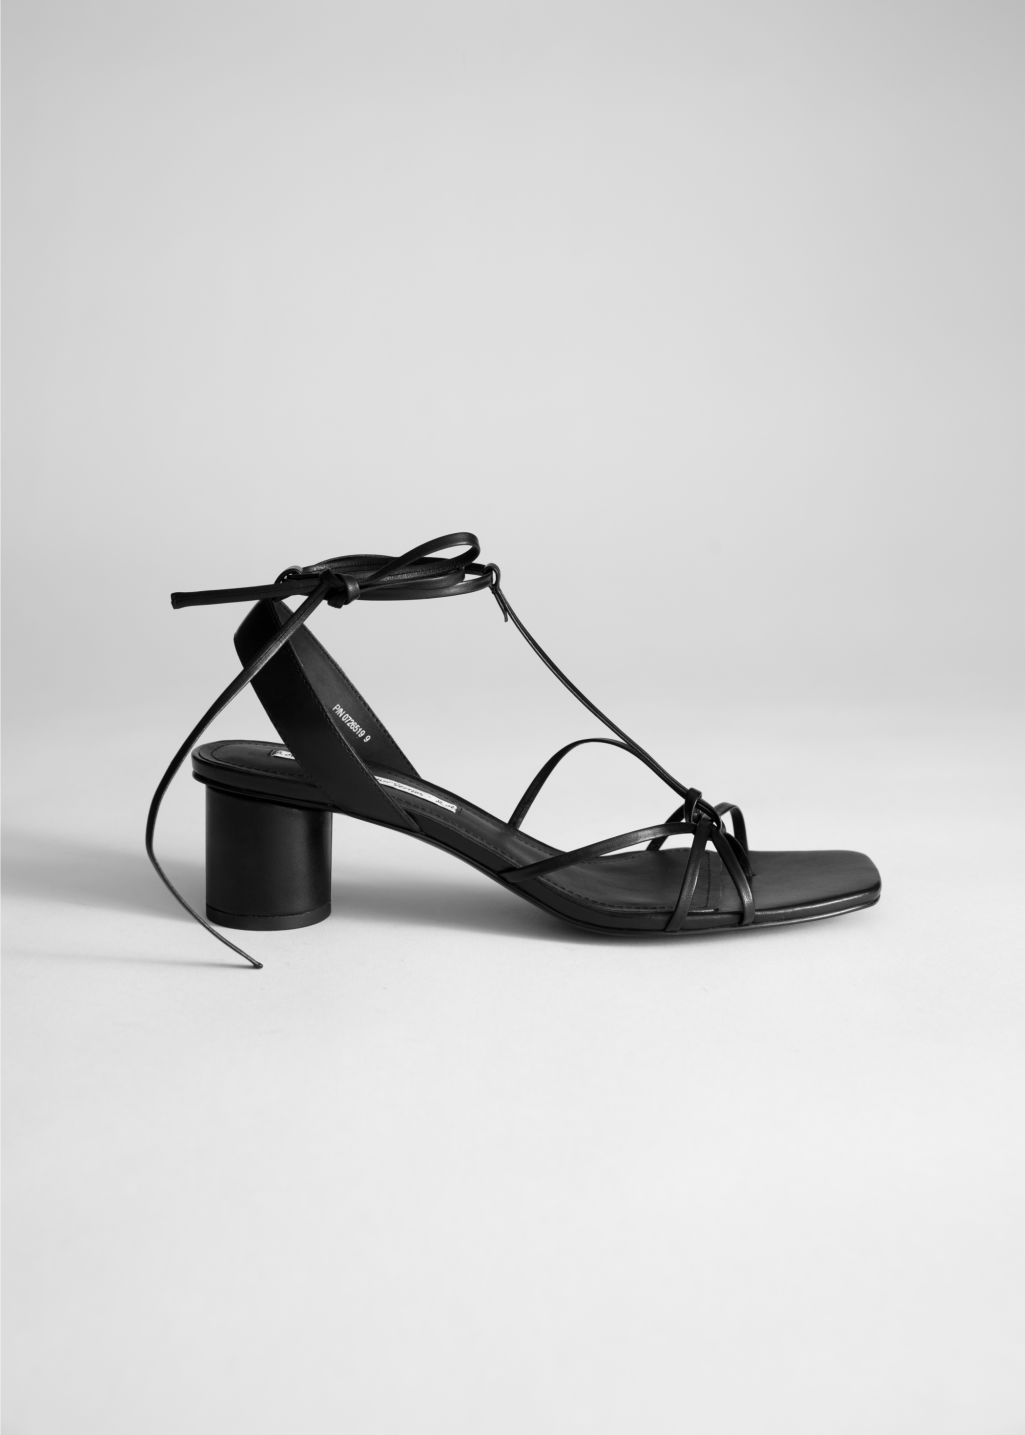 Square Toe Lace Up Heeled Sandals Black Heeled Sandals Other Stories Strappy Sandals Heels Sandals Heels High Heel Sandals